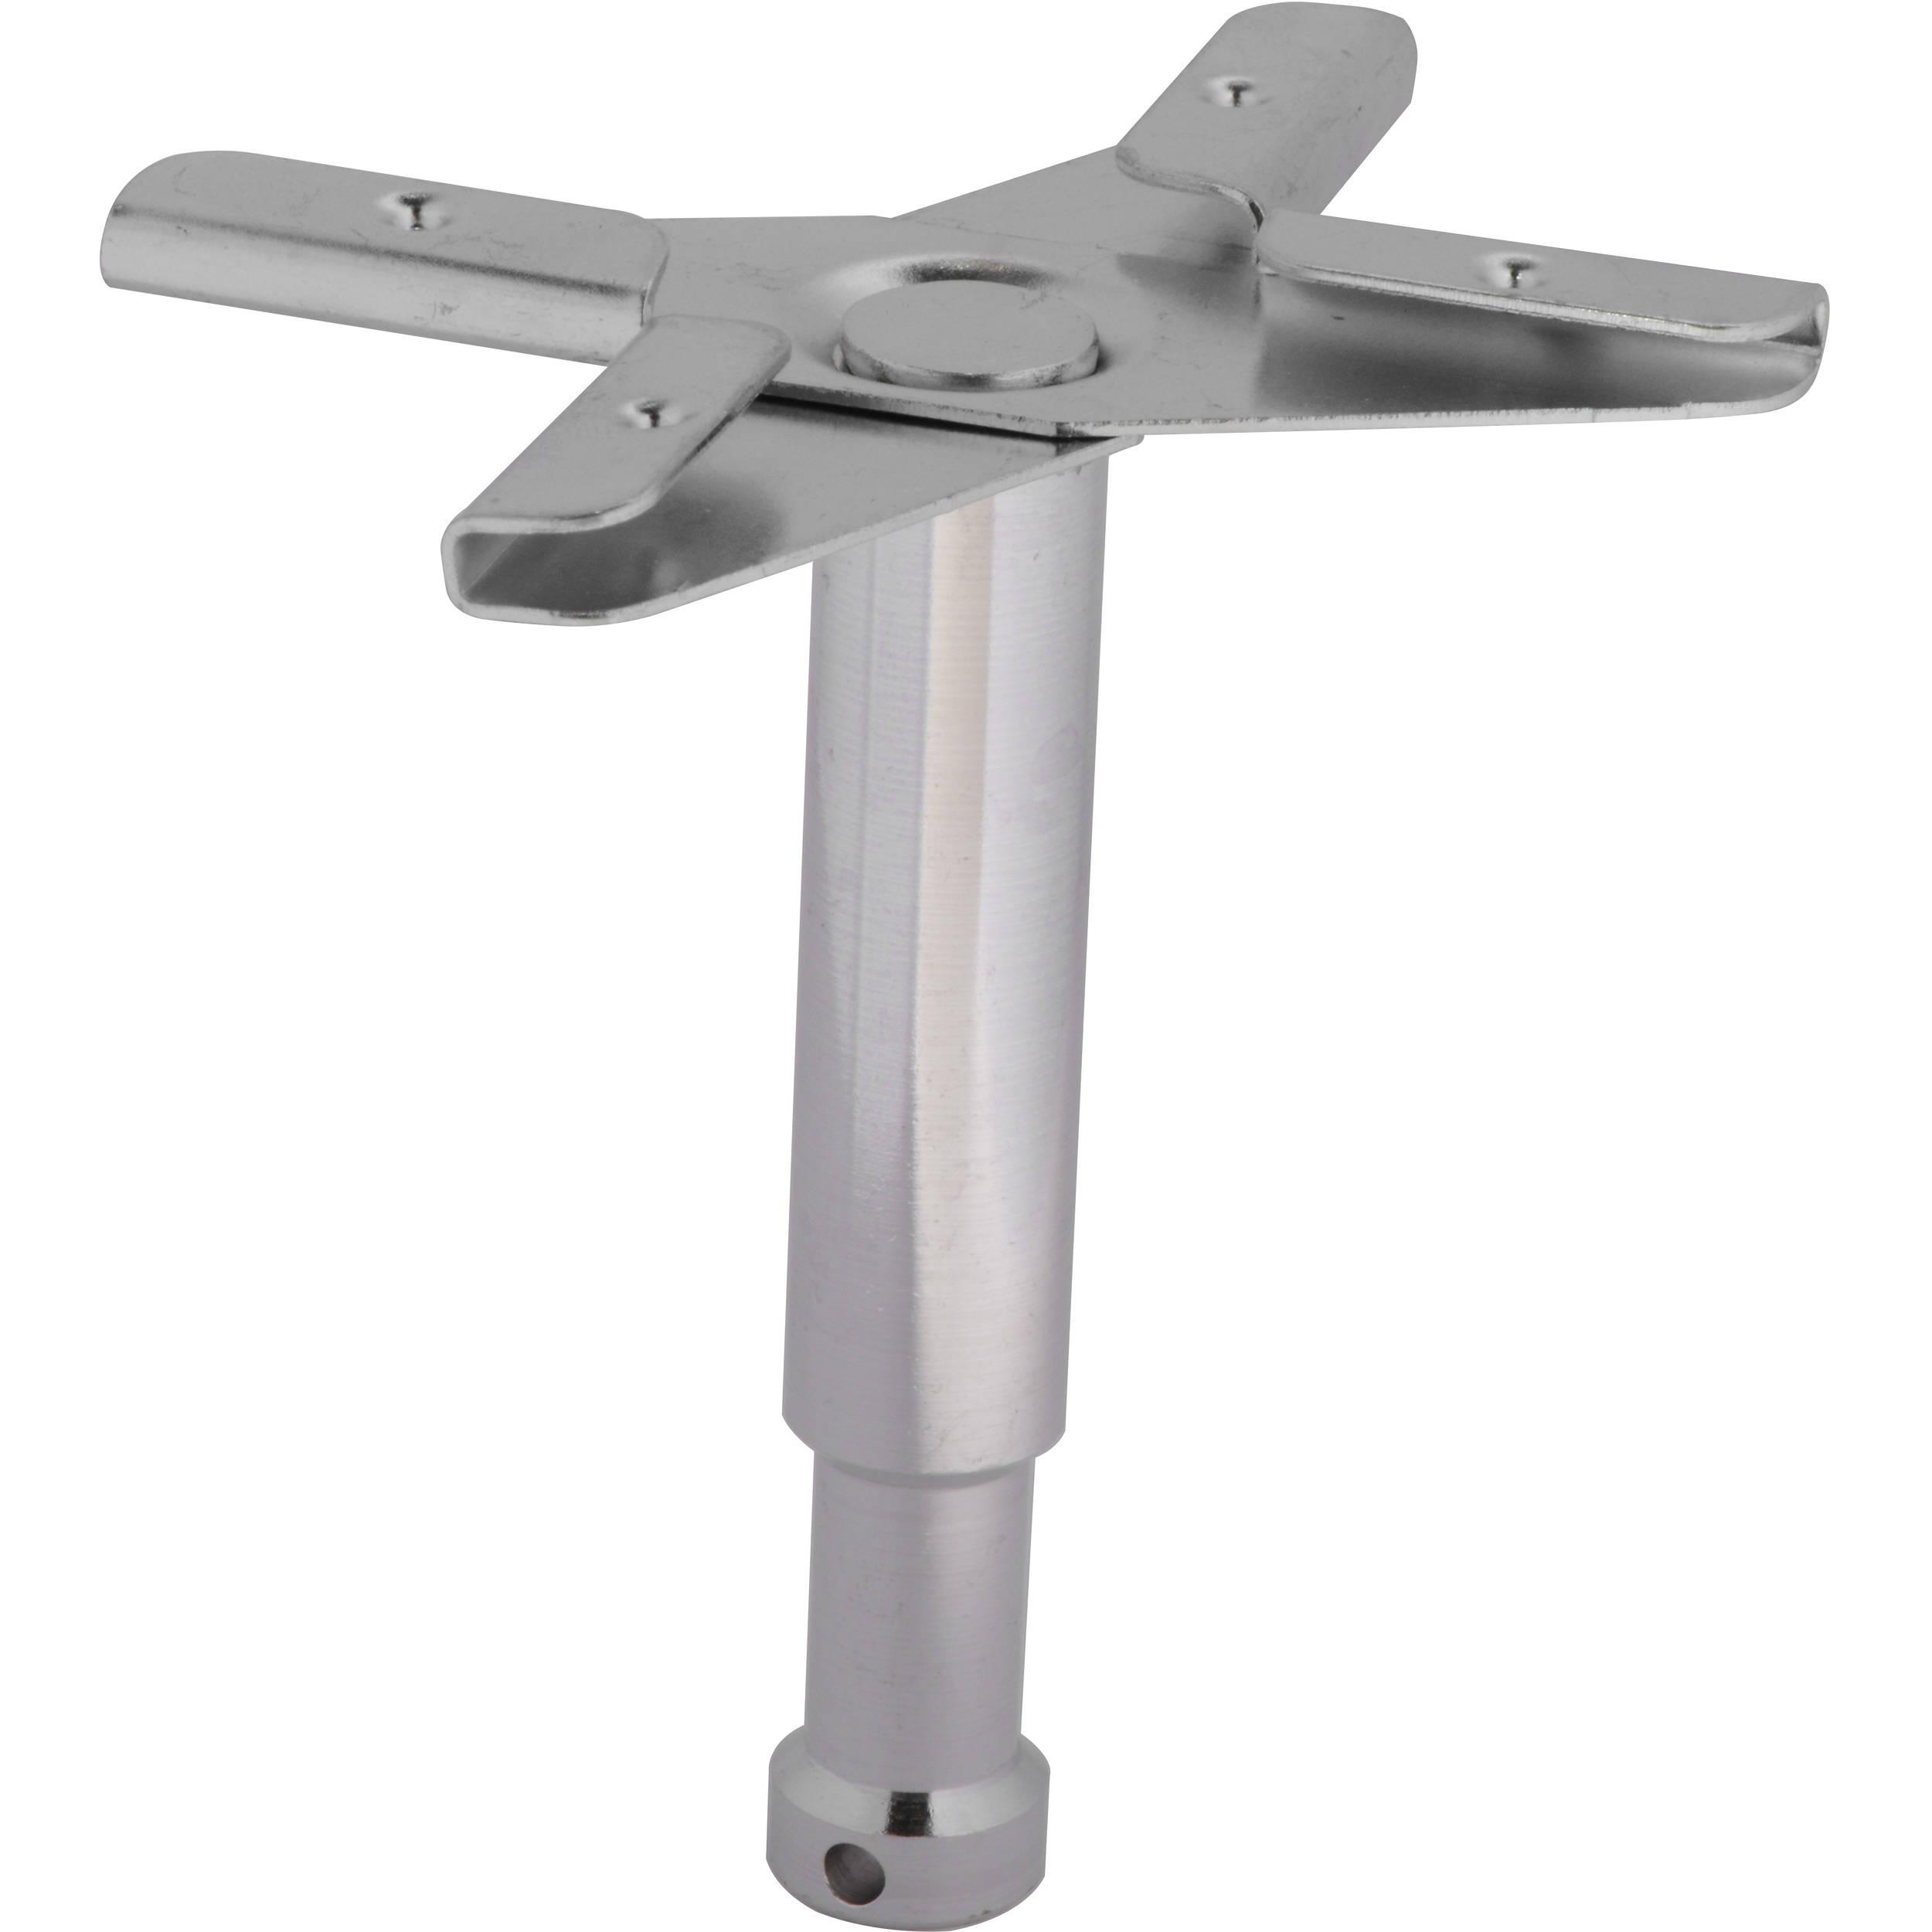 Suspended Ceiling Hardware : Avenger c drop ceiling scissor clamp b h photo video